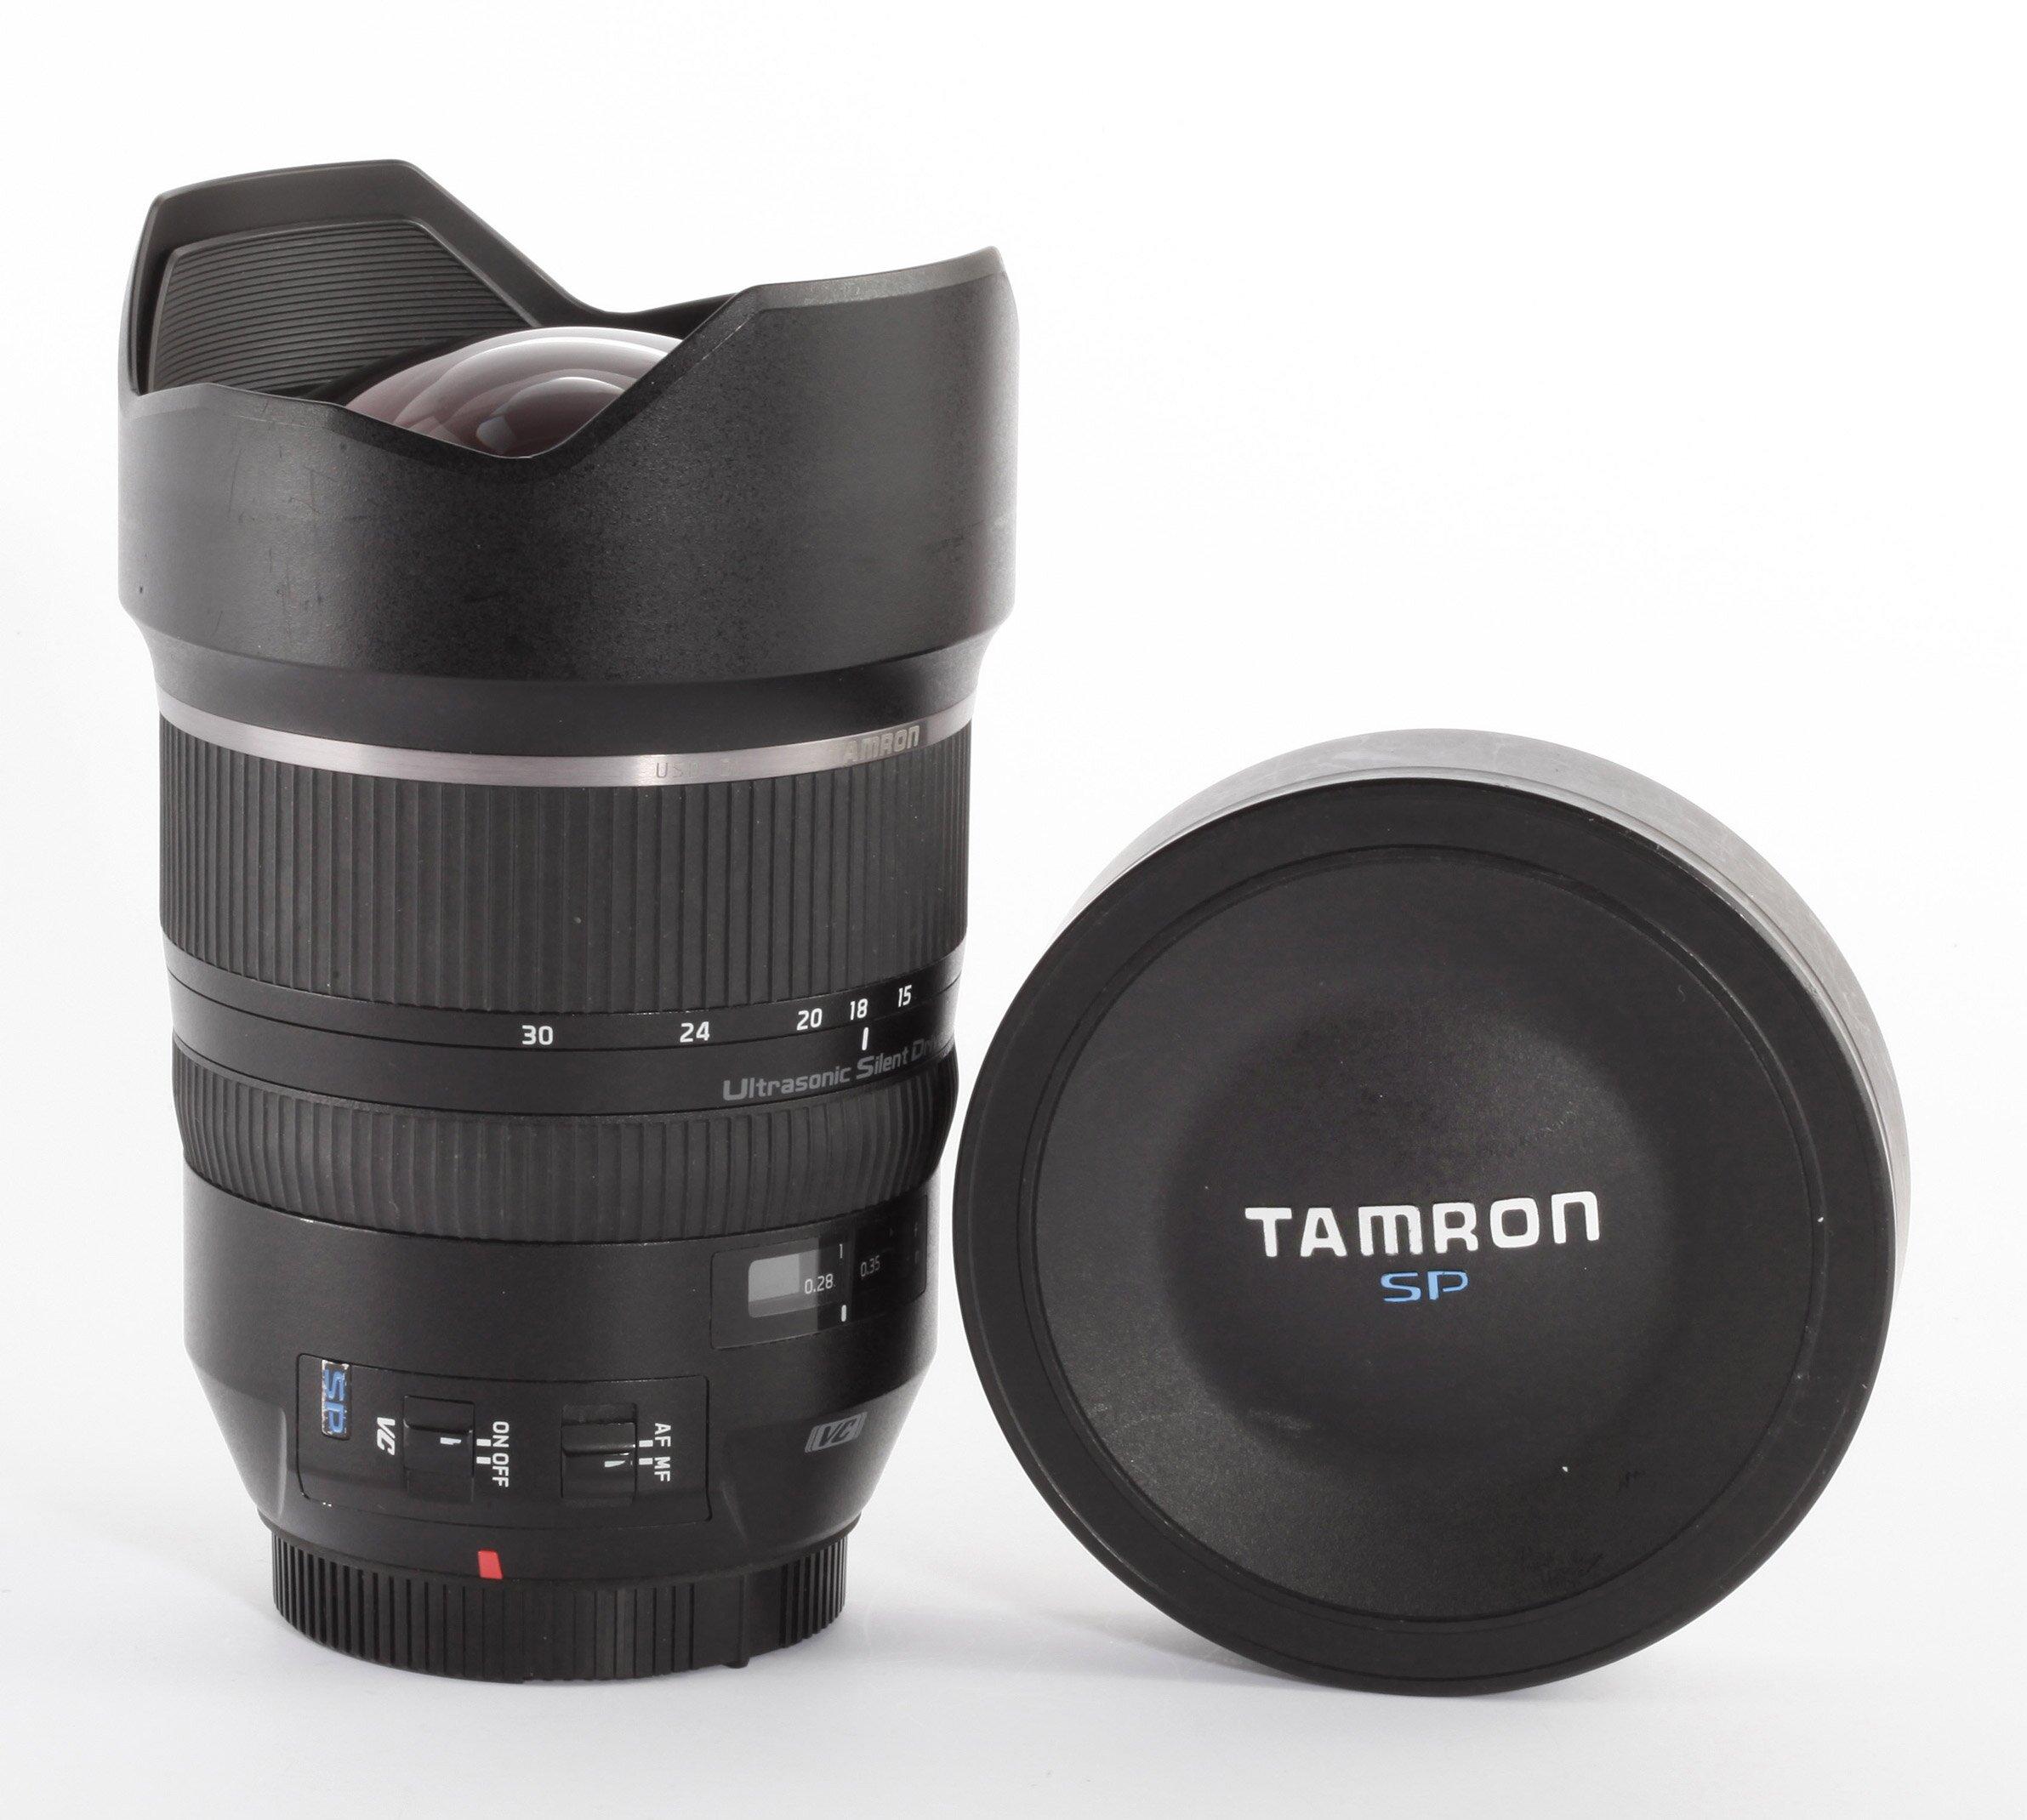 Tamron SP15-30mm/2,8 USD Di